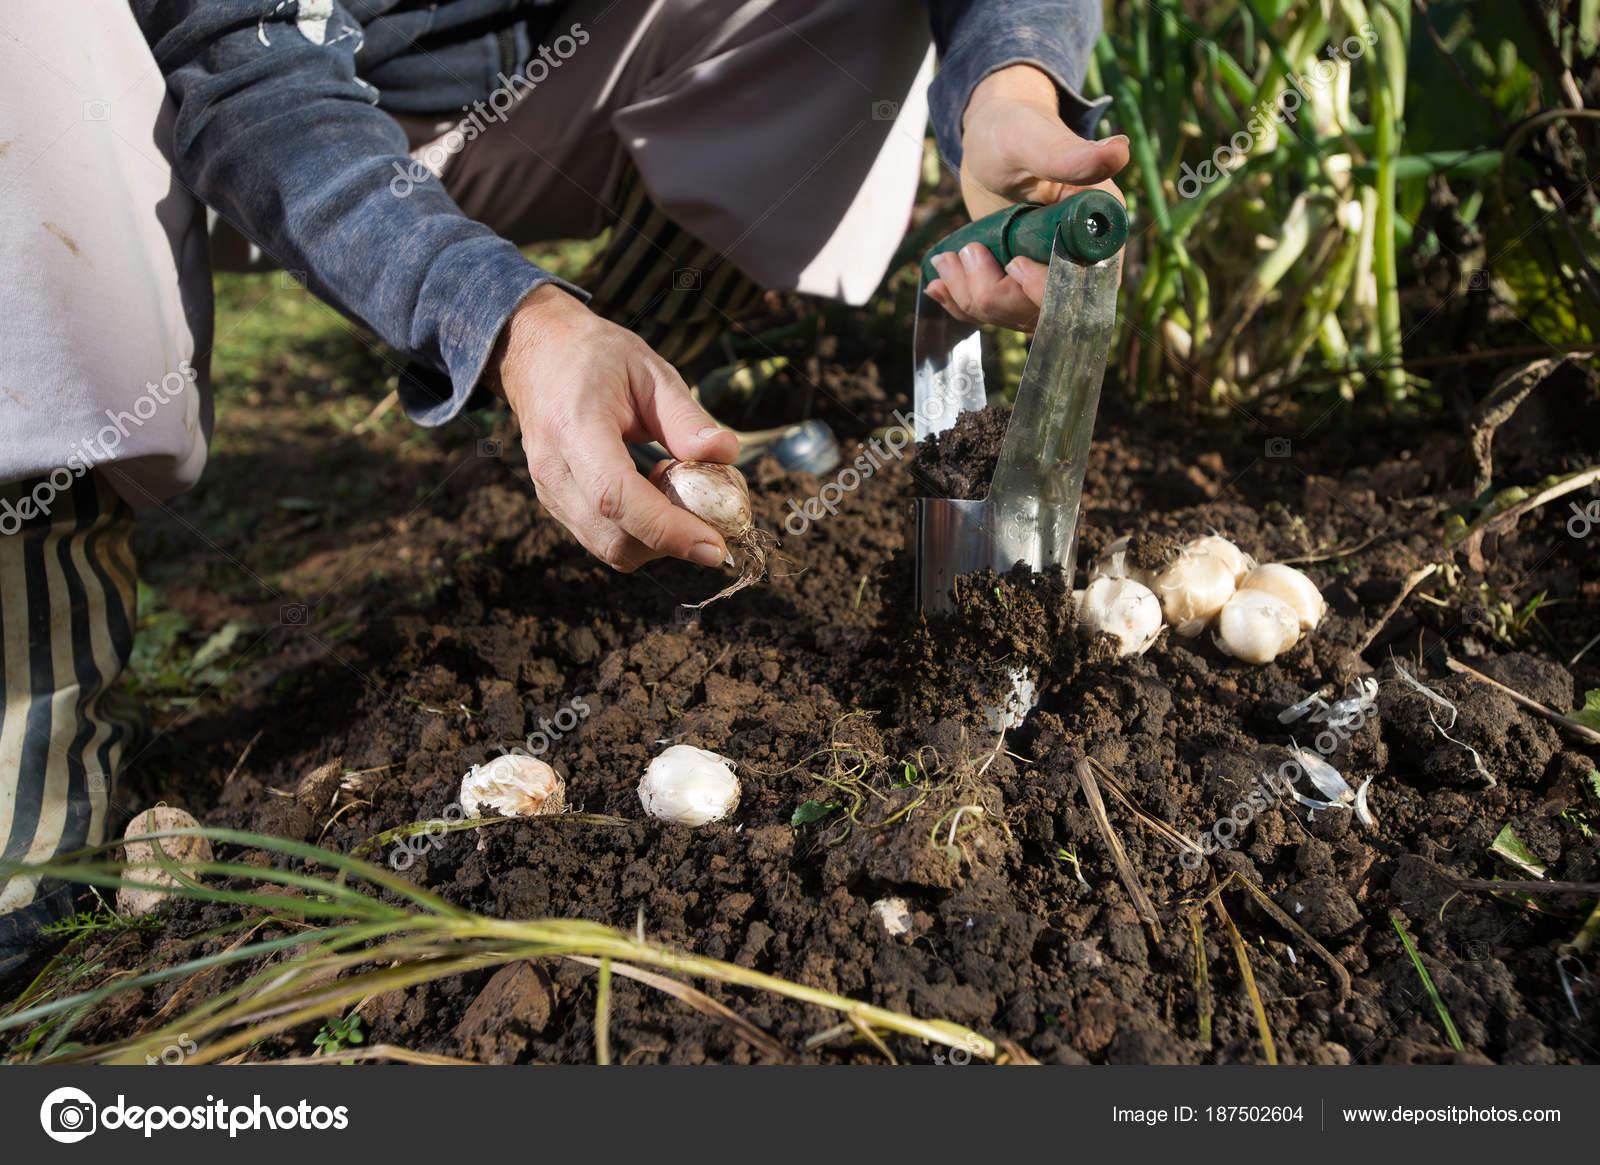 Close Hand Planting Bulbs Flower Bulb Planter Outdoors Garden Use